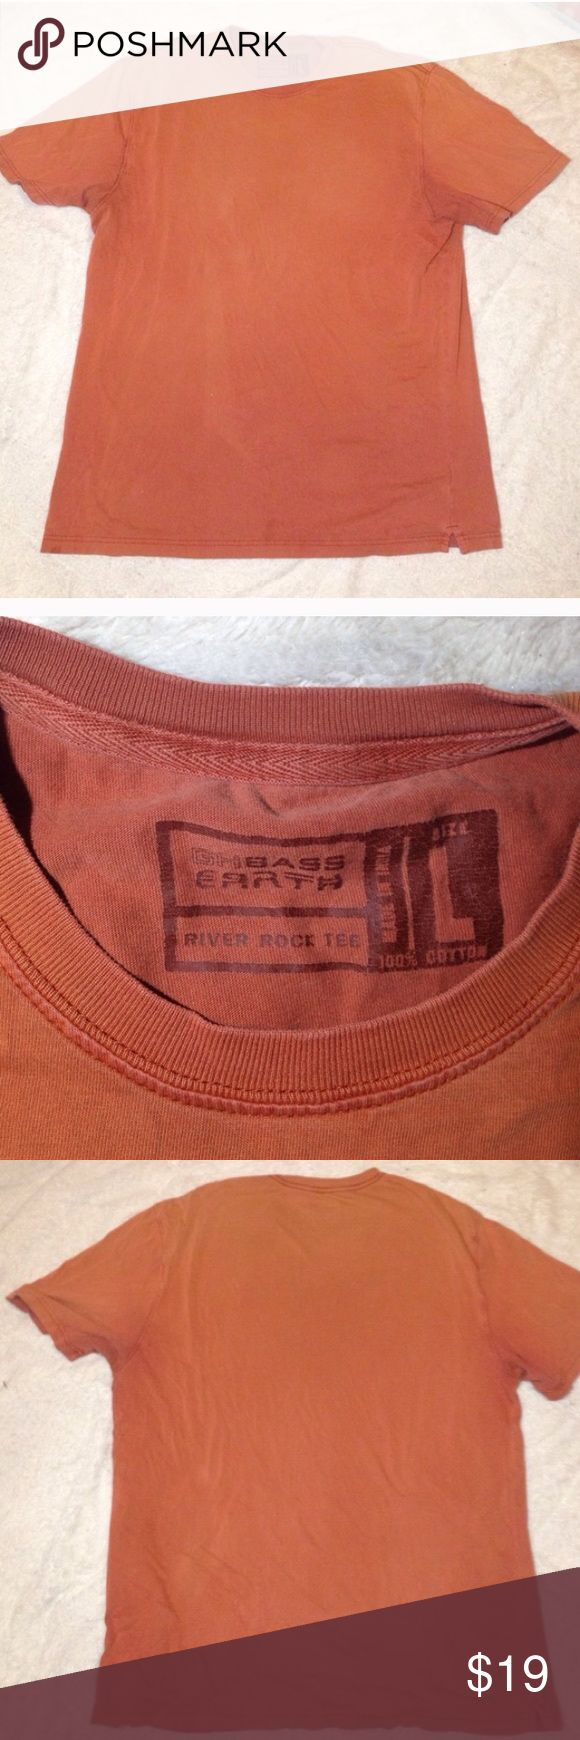 ❤️MAKE OFFER orange men's large short sleeve top G.H. Bass men's large burnt orange shirt w short sleeves. Super soft and comfortable ! Bass Shirts Tees - Short Sleeve